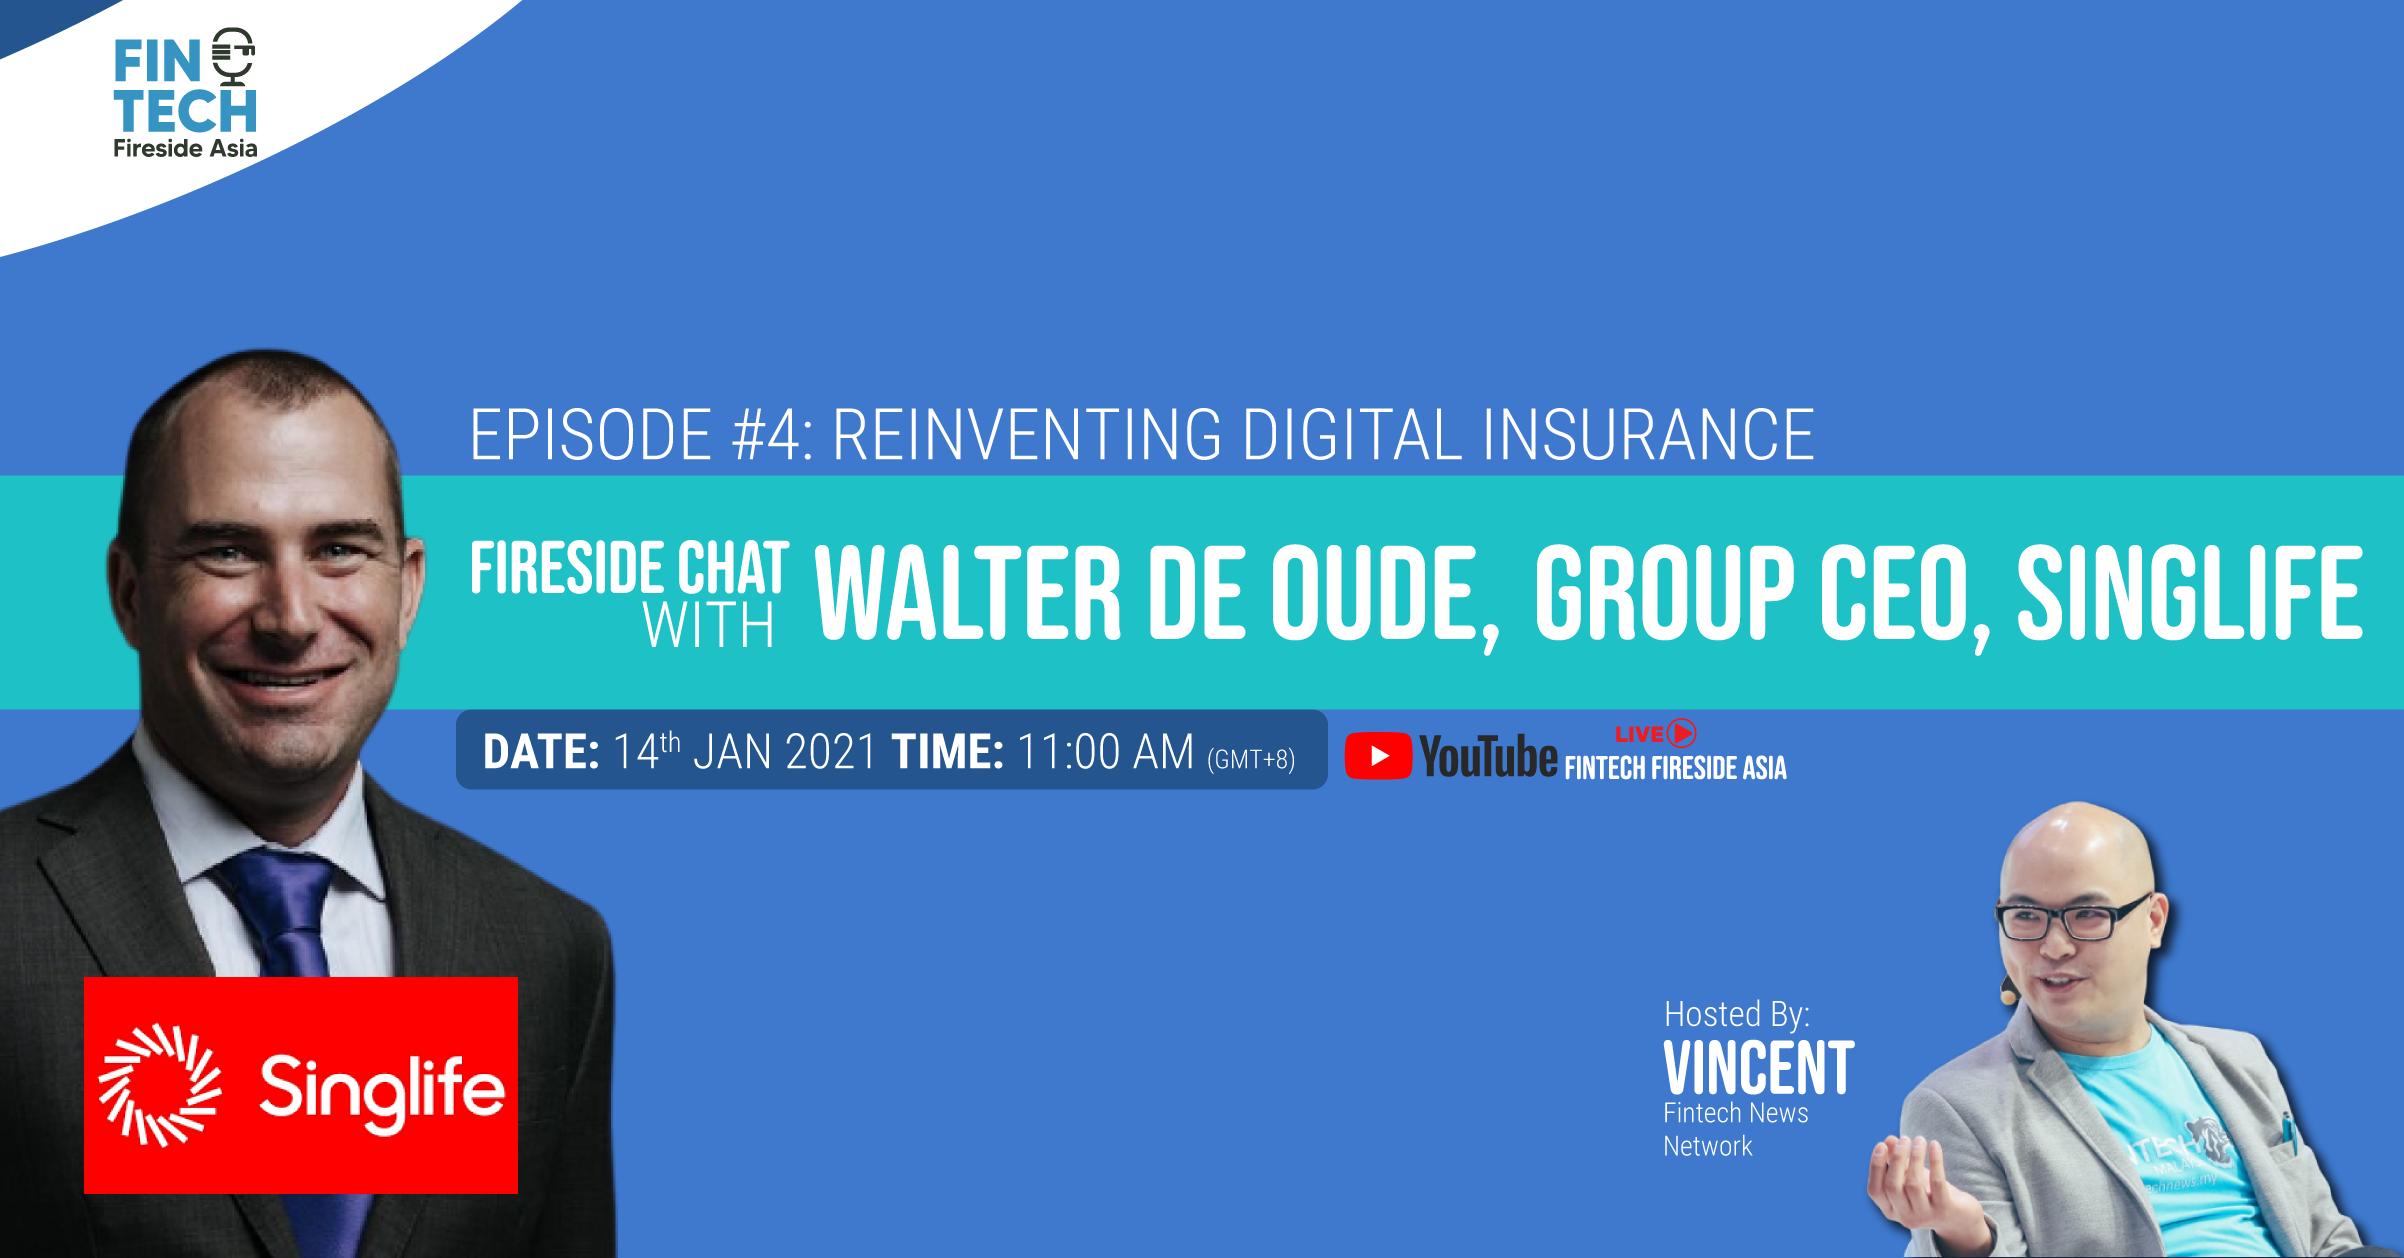 Ep #4: Reinventing Digital Insurance